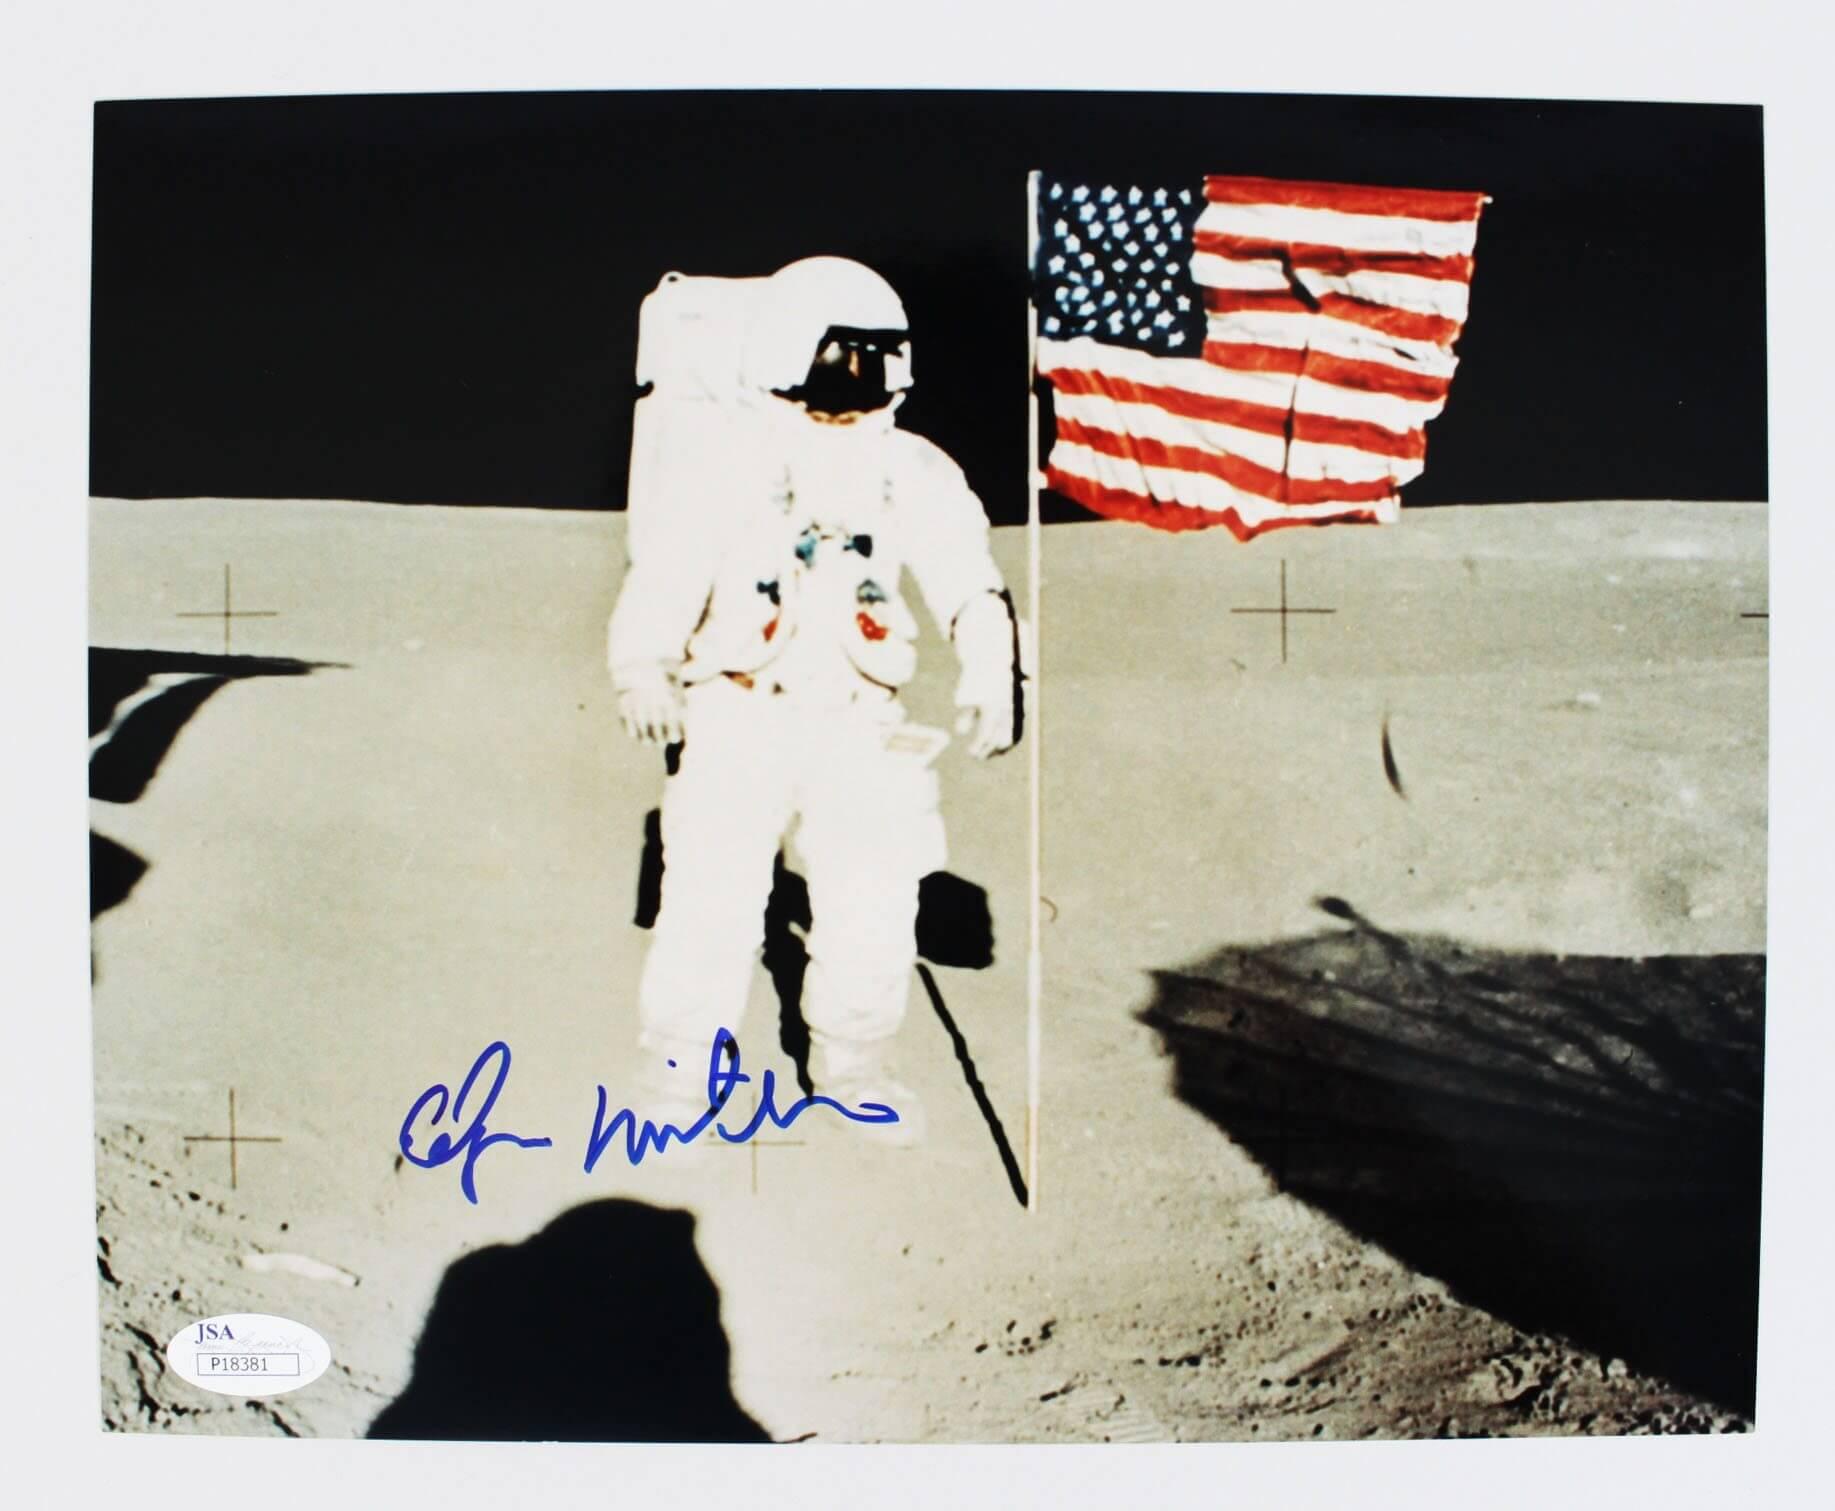 Astronaut - Edgar Mitchell Signed Apollo 14 Mission Photo - COA JSA